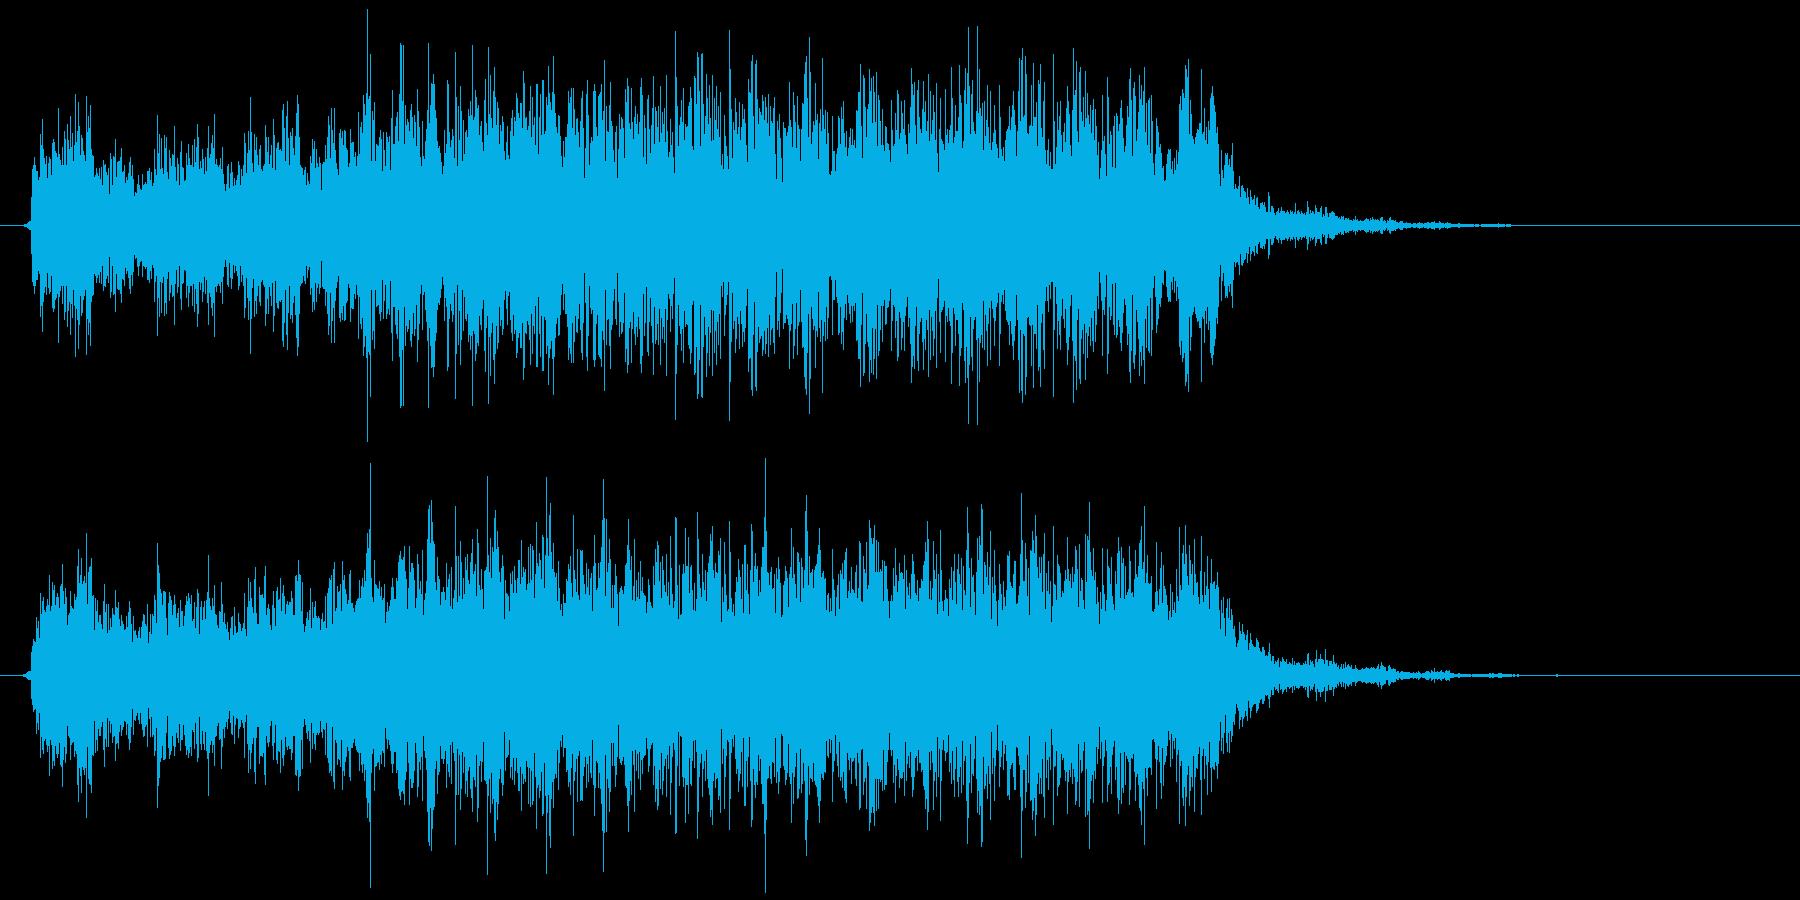 CDドライブ 読み込み(キュルル…キッ)の再生済みの波形